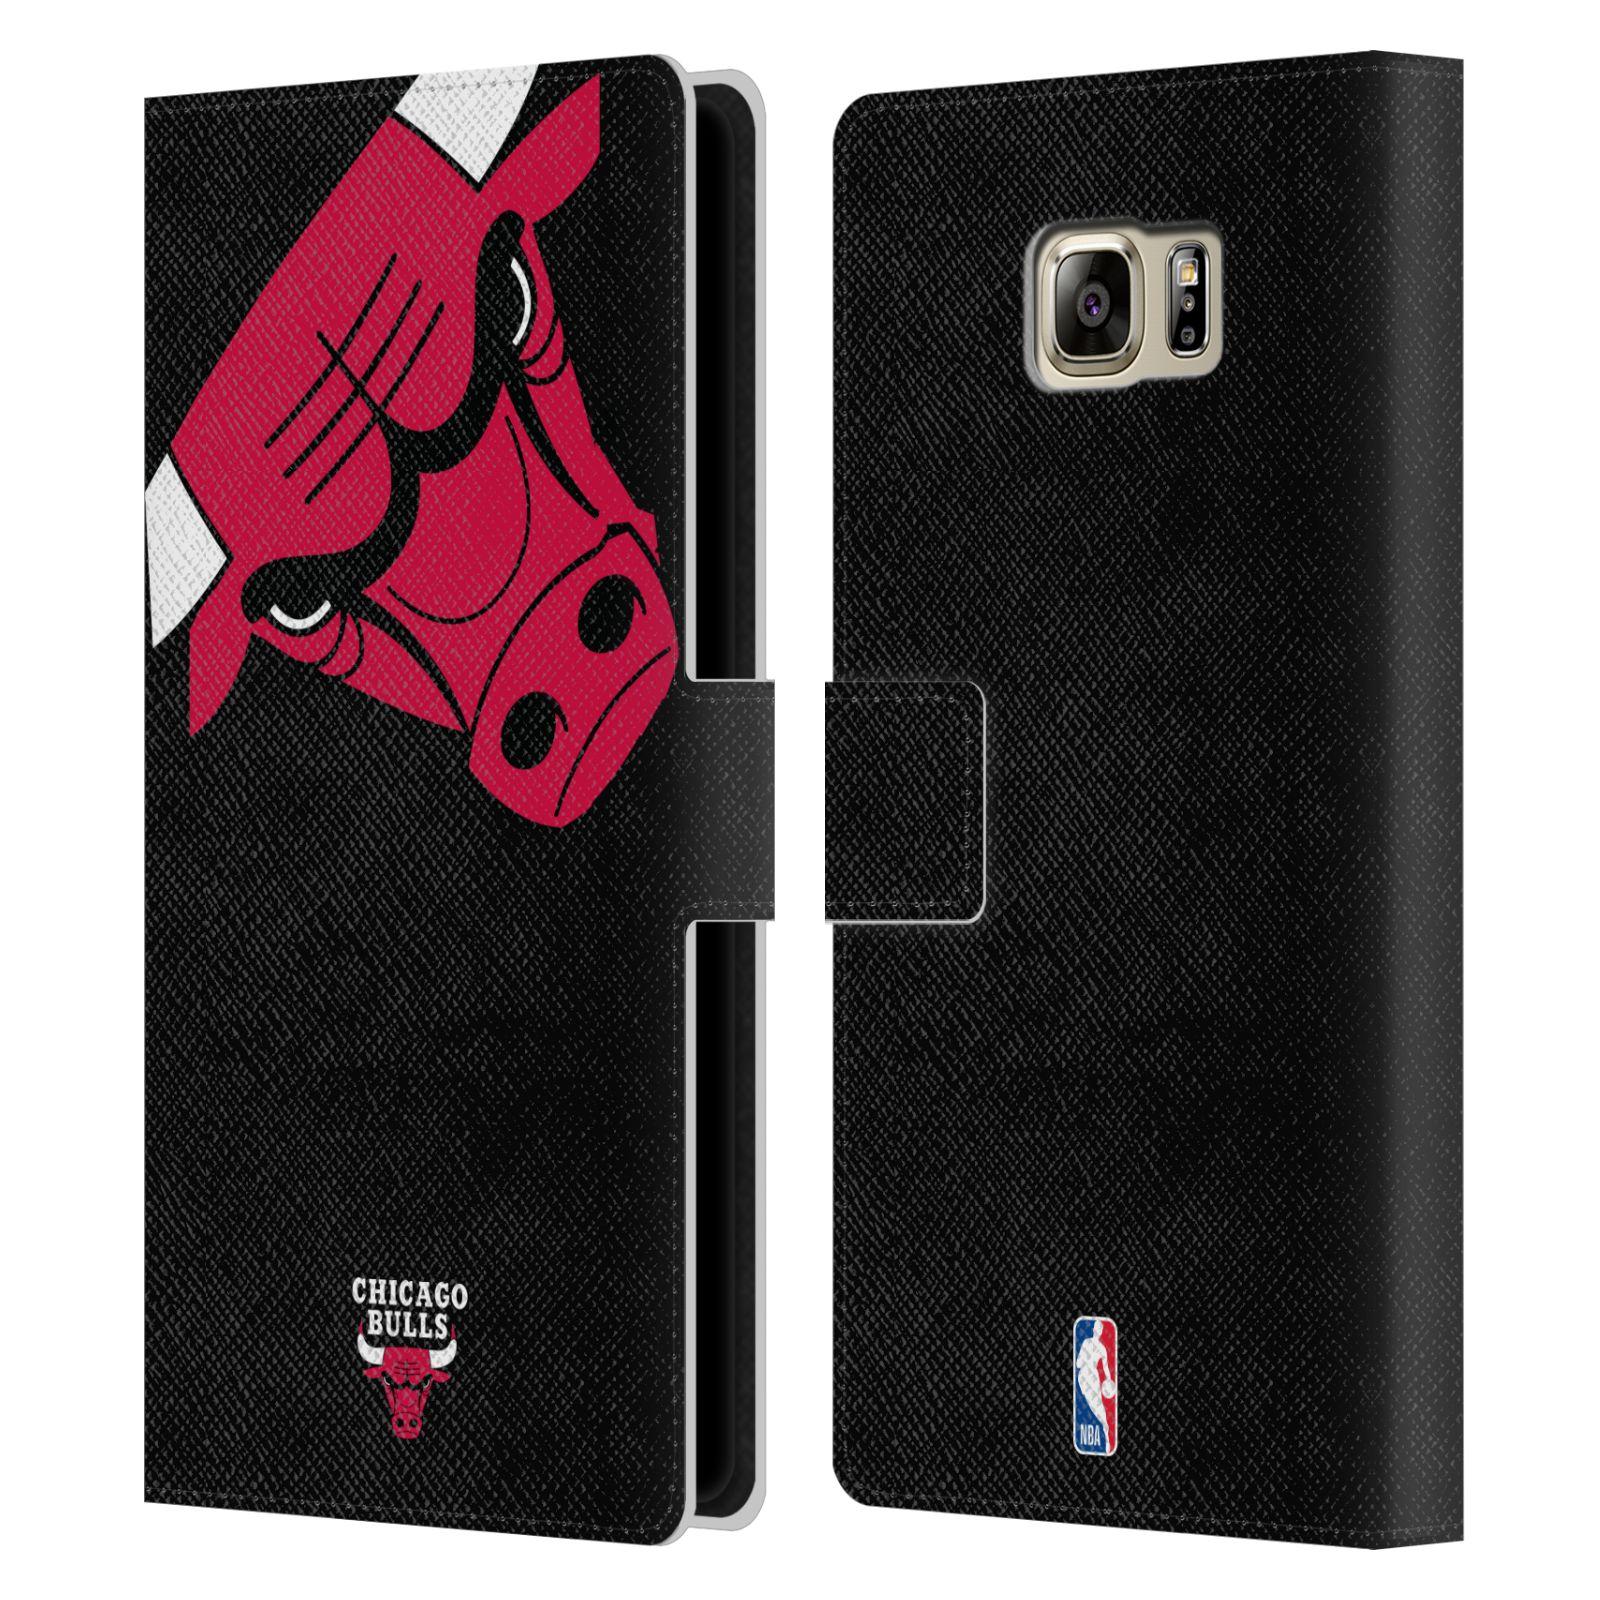 Pouzdro na mobil Samsung Galaxy NOTE 5 - Head Case -NBA - Chicago Bulls červená barva velký znak